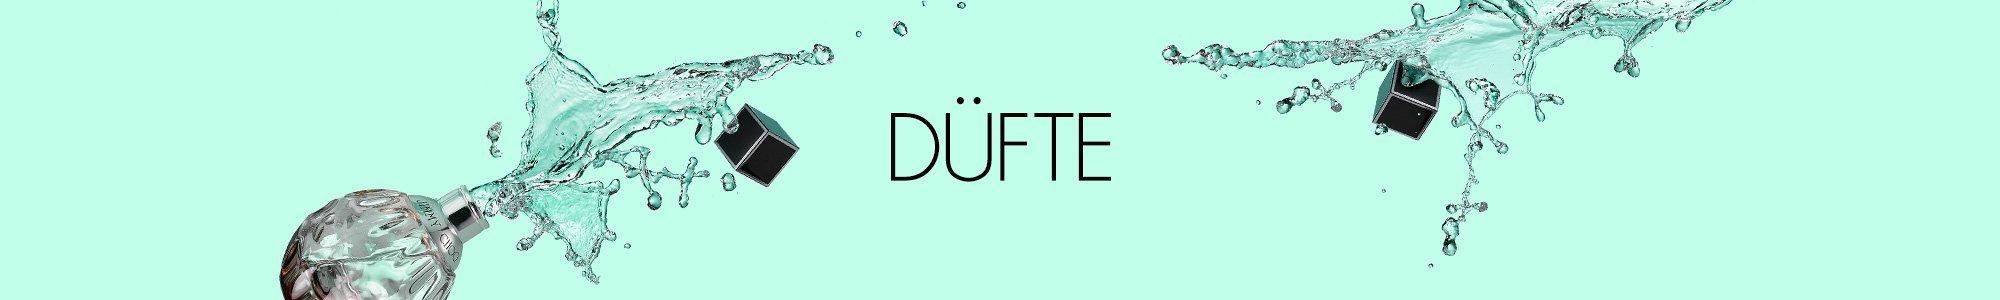 Parfum & Düfte